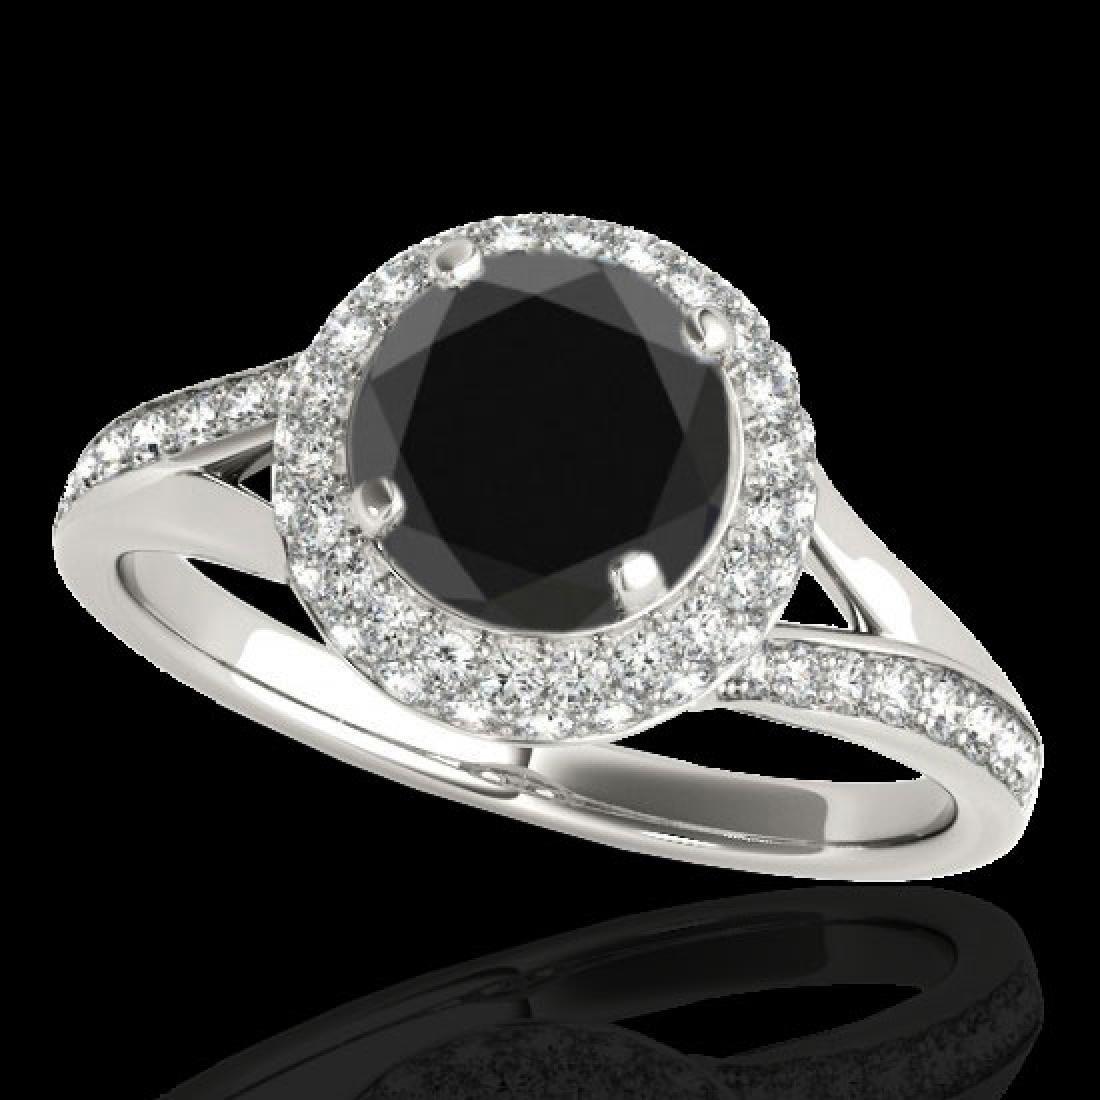 1.85 CTW Certified VS Black Diamond Solitaire Halo Ring